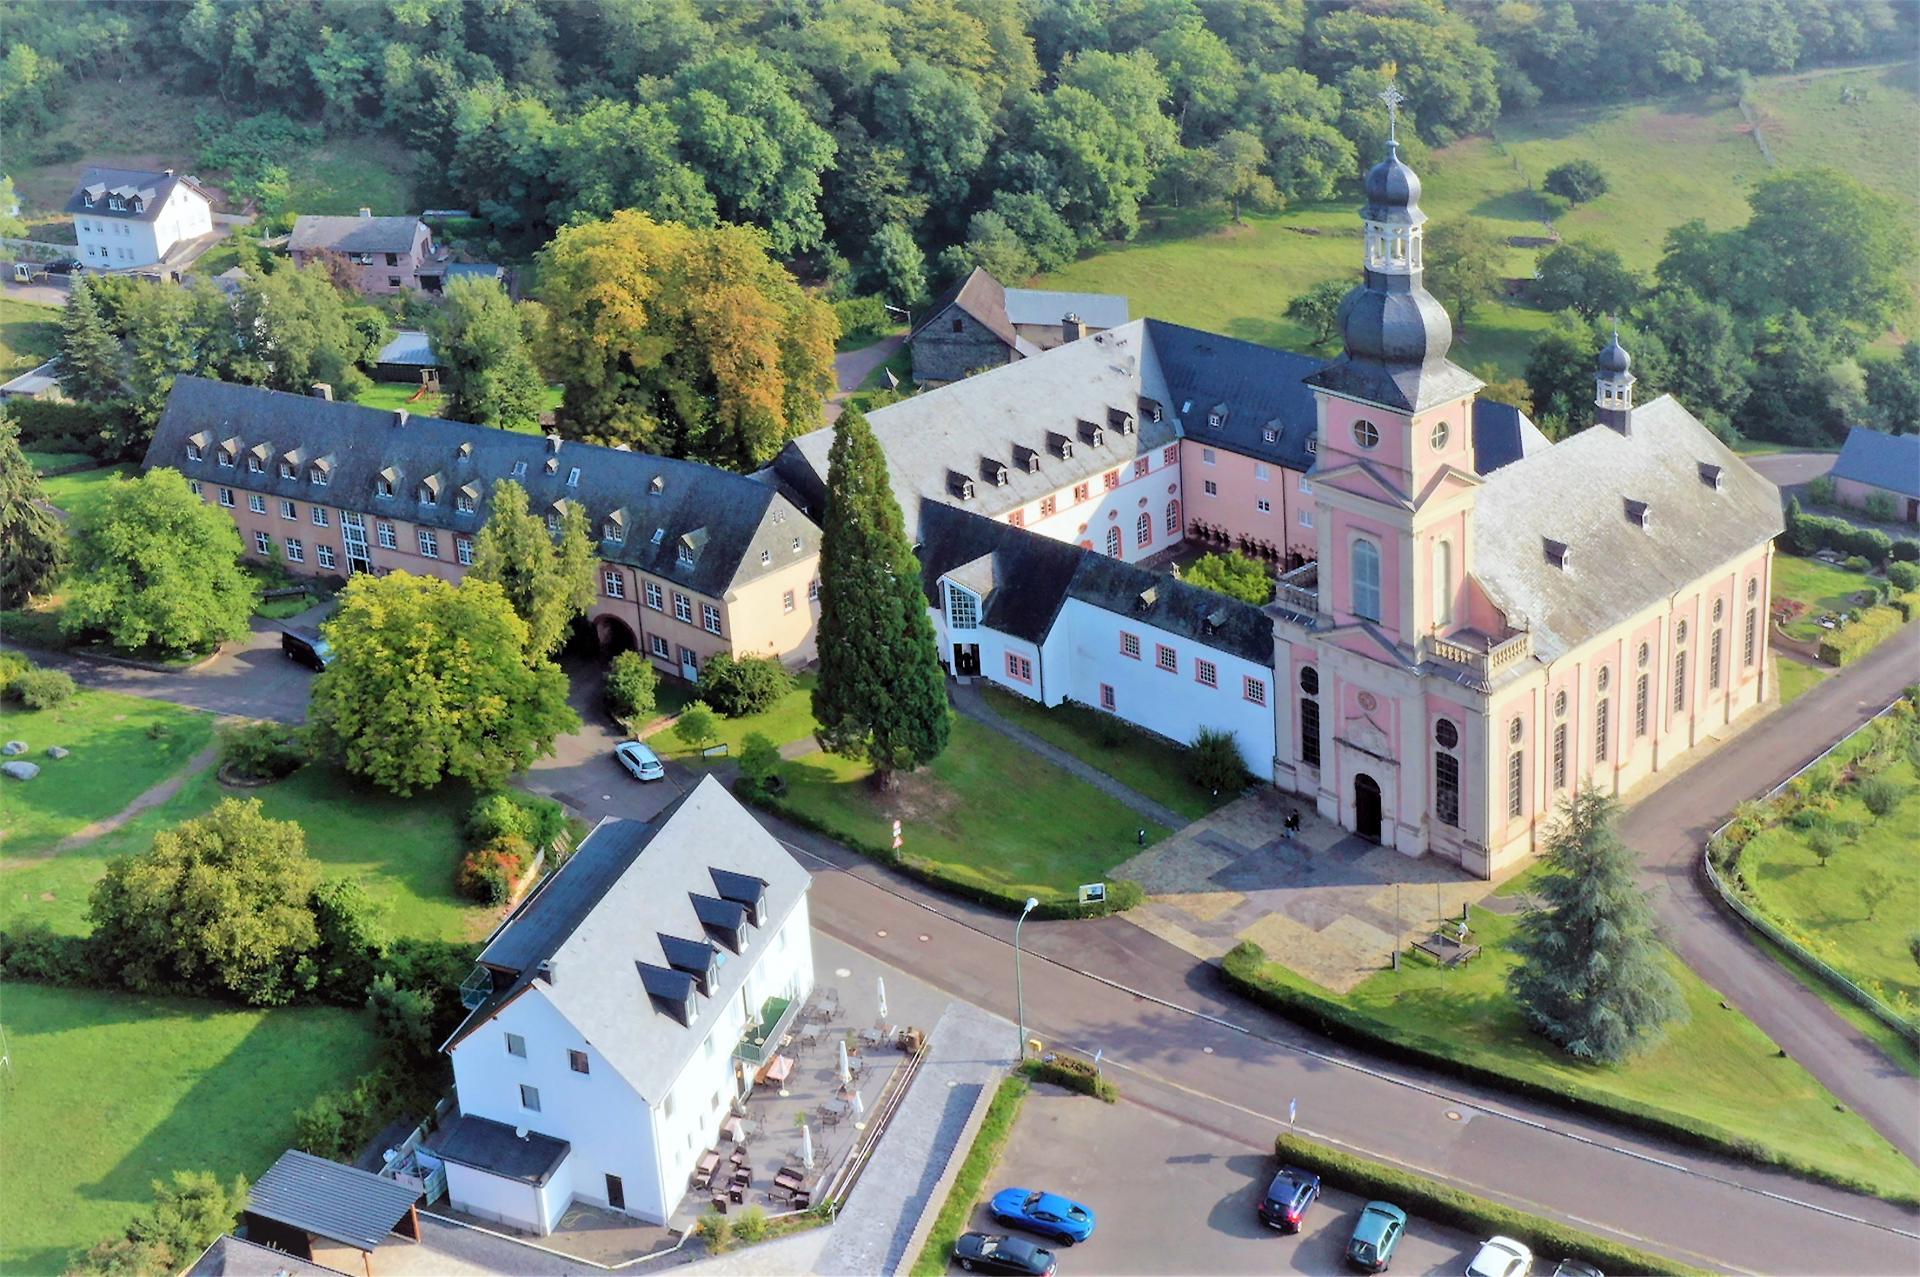 Luftbild Kloster Springiergsbach ©Pfaffe